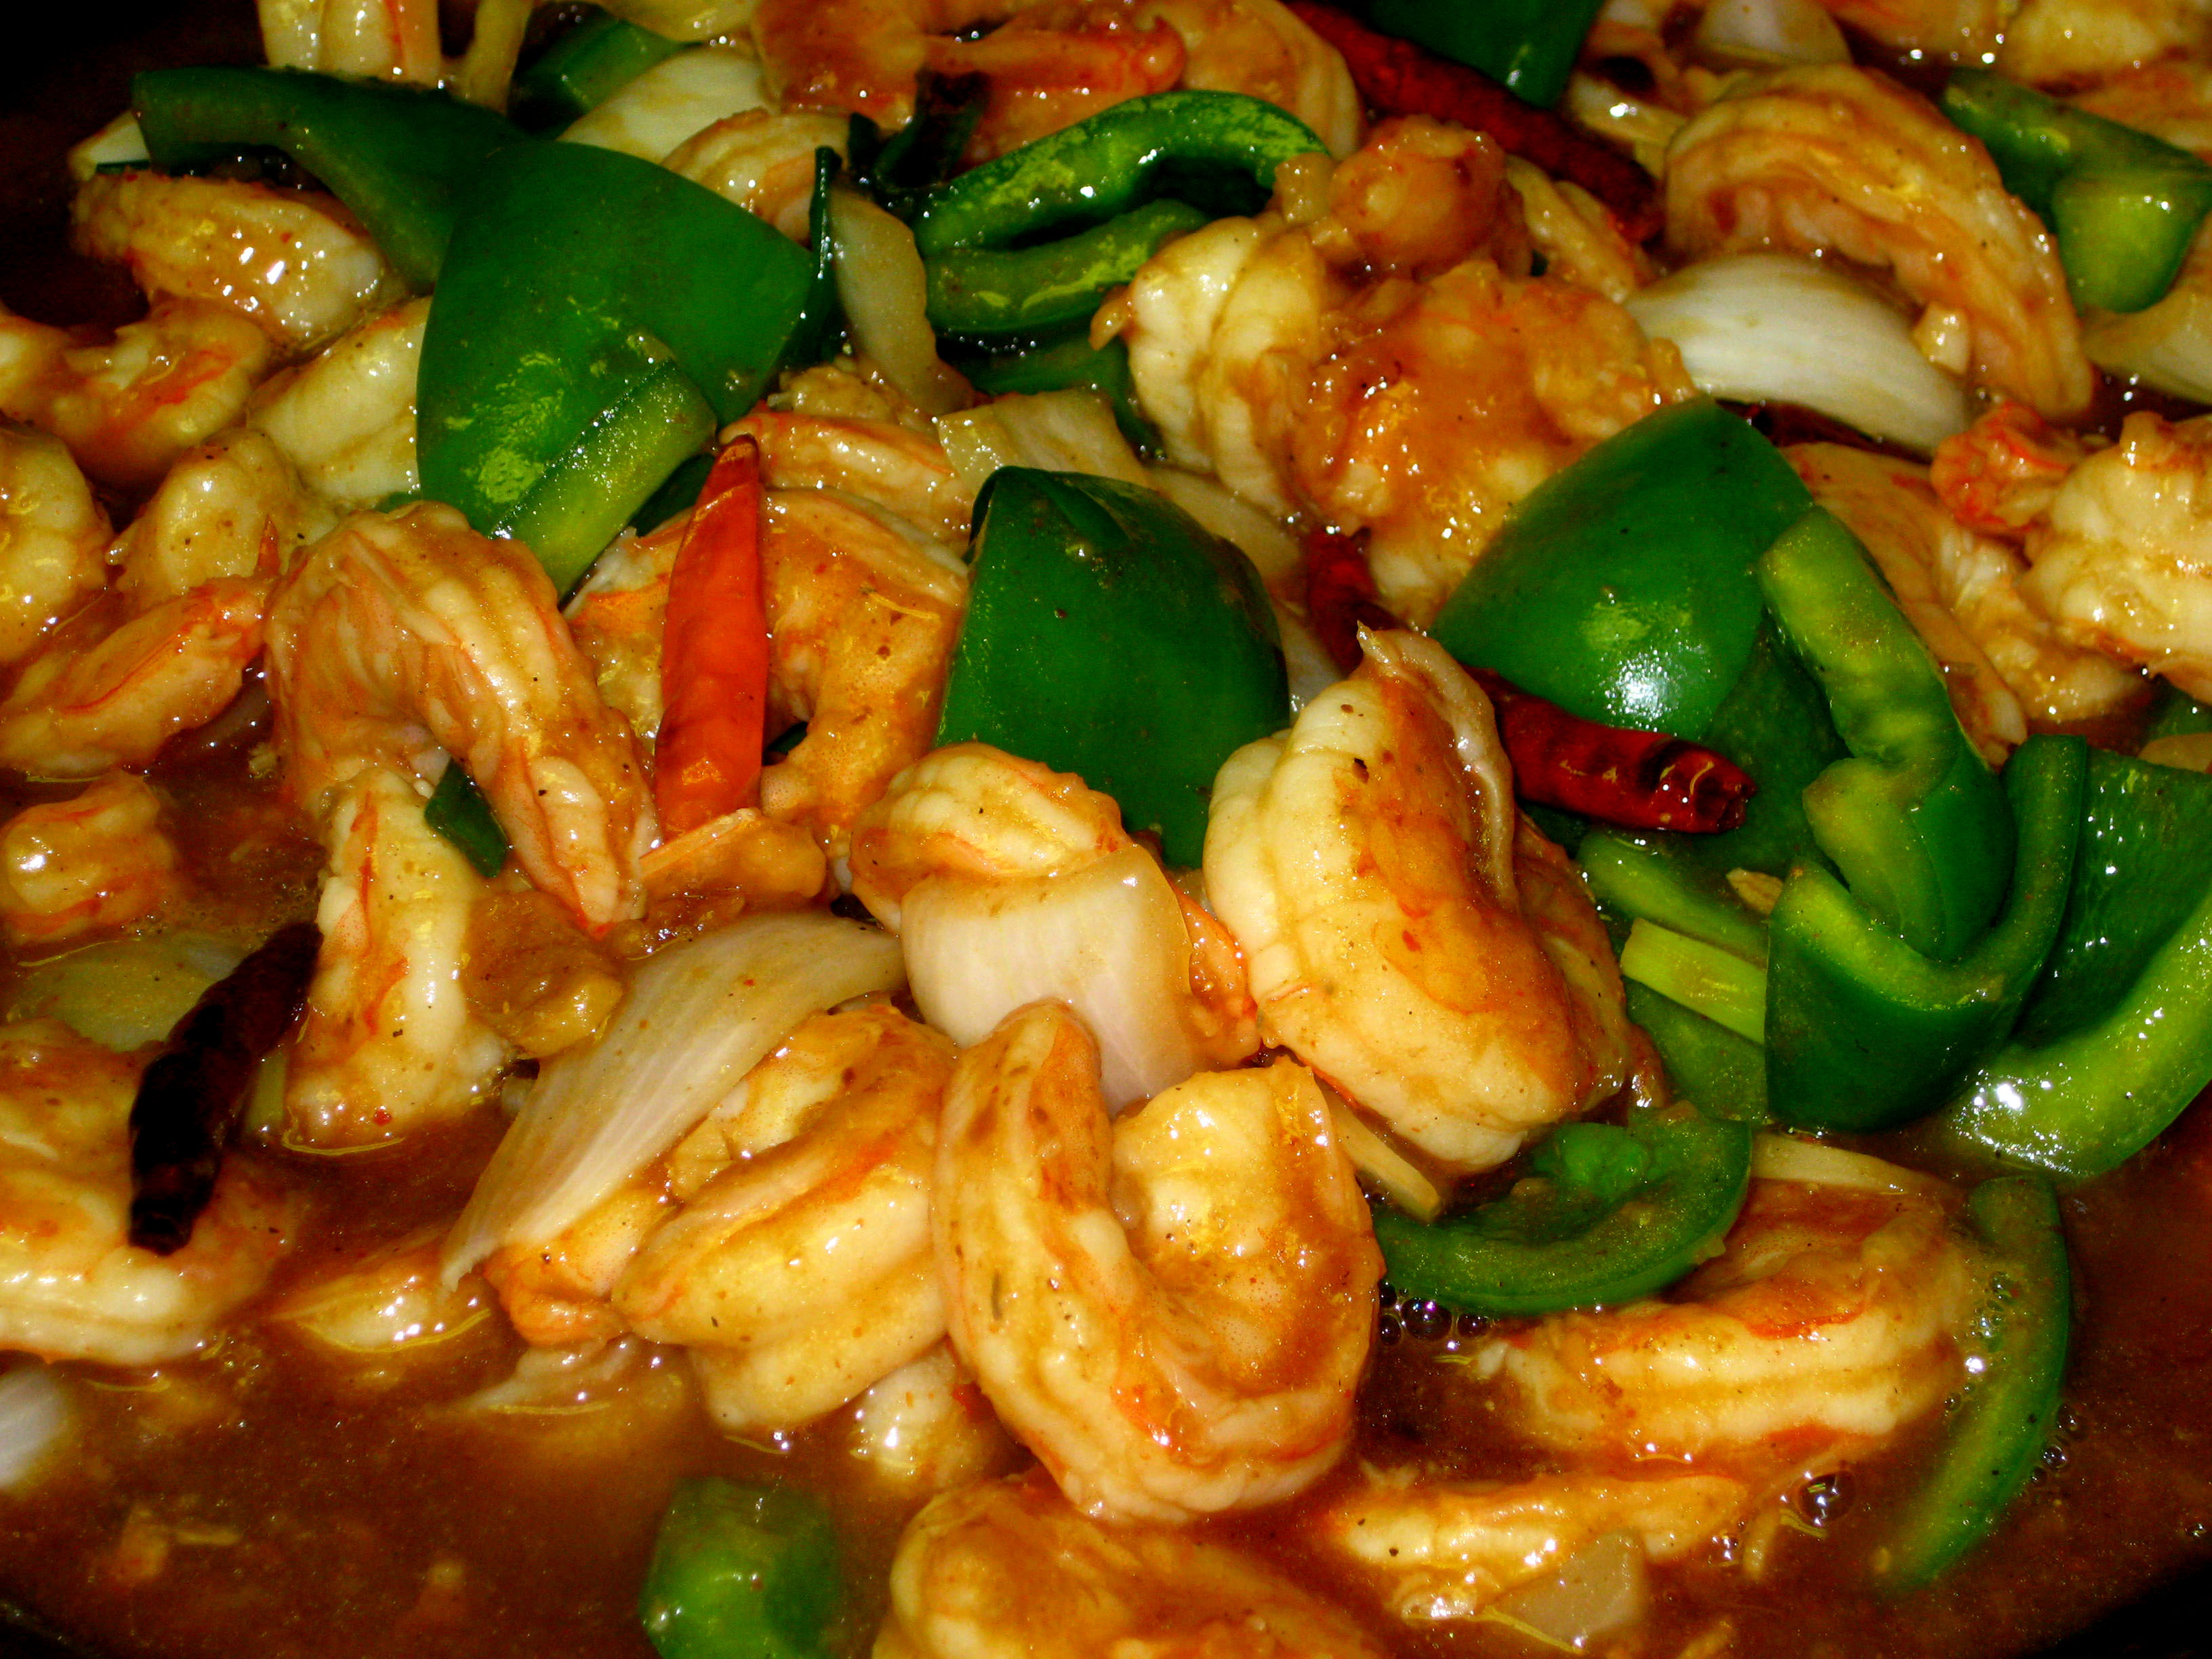 Shrimp with Black Bean Garlic Sauce | AmerAsian Home Cooking